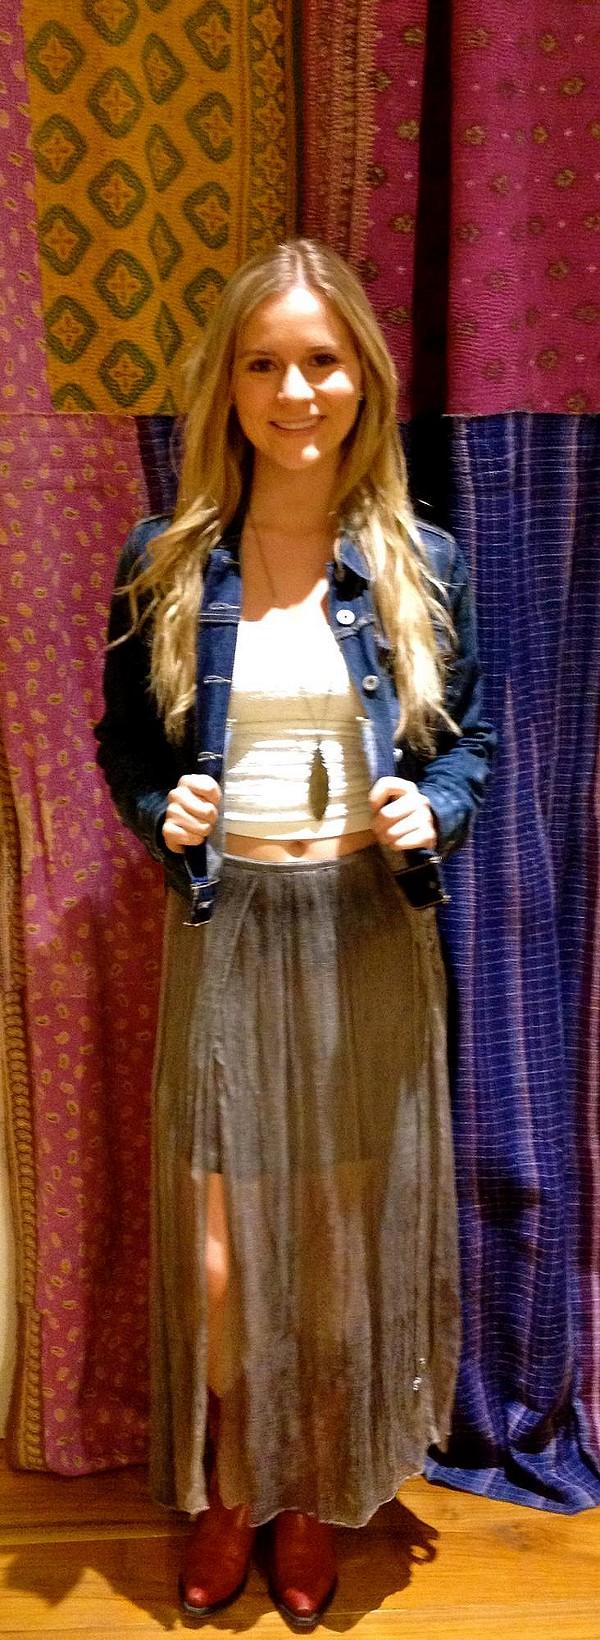 Loving this skirt for some fun festival fashion! <